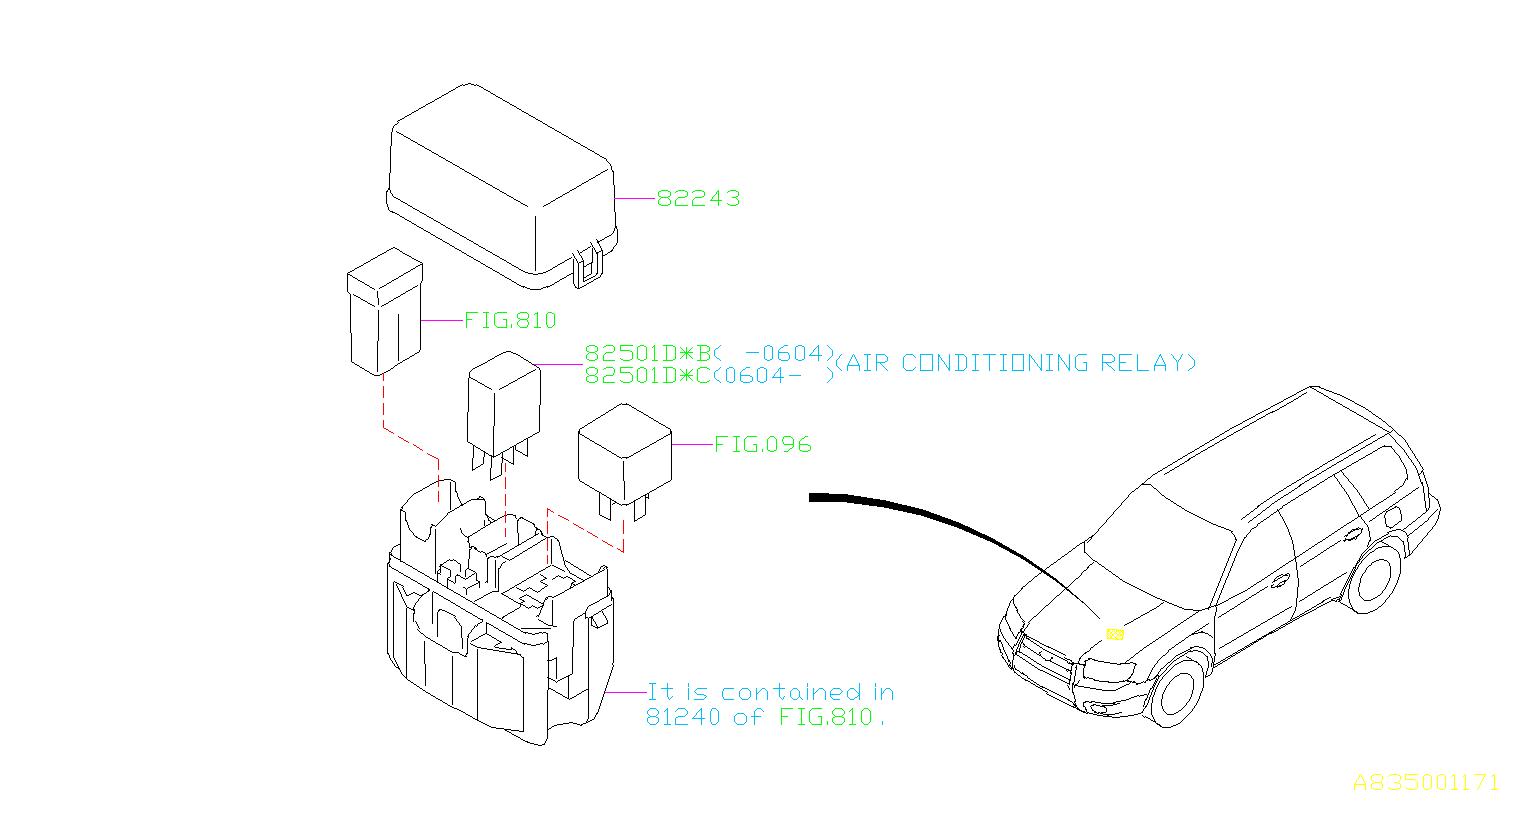 2005 Subaru Forester Relay  Electrical  Body  Control - 82501ae03a